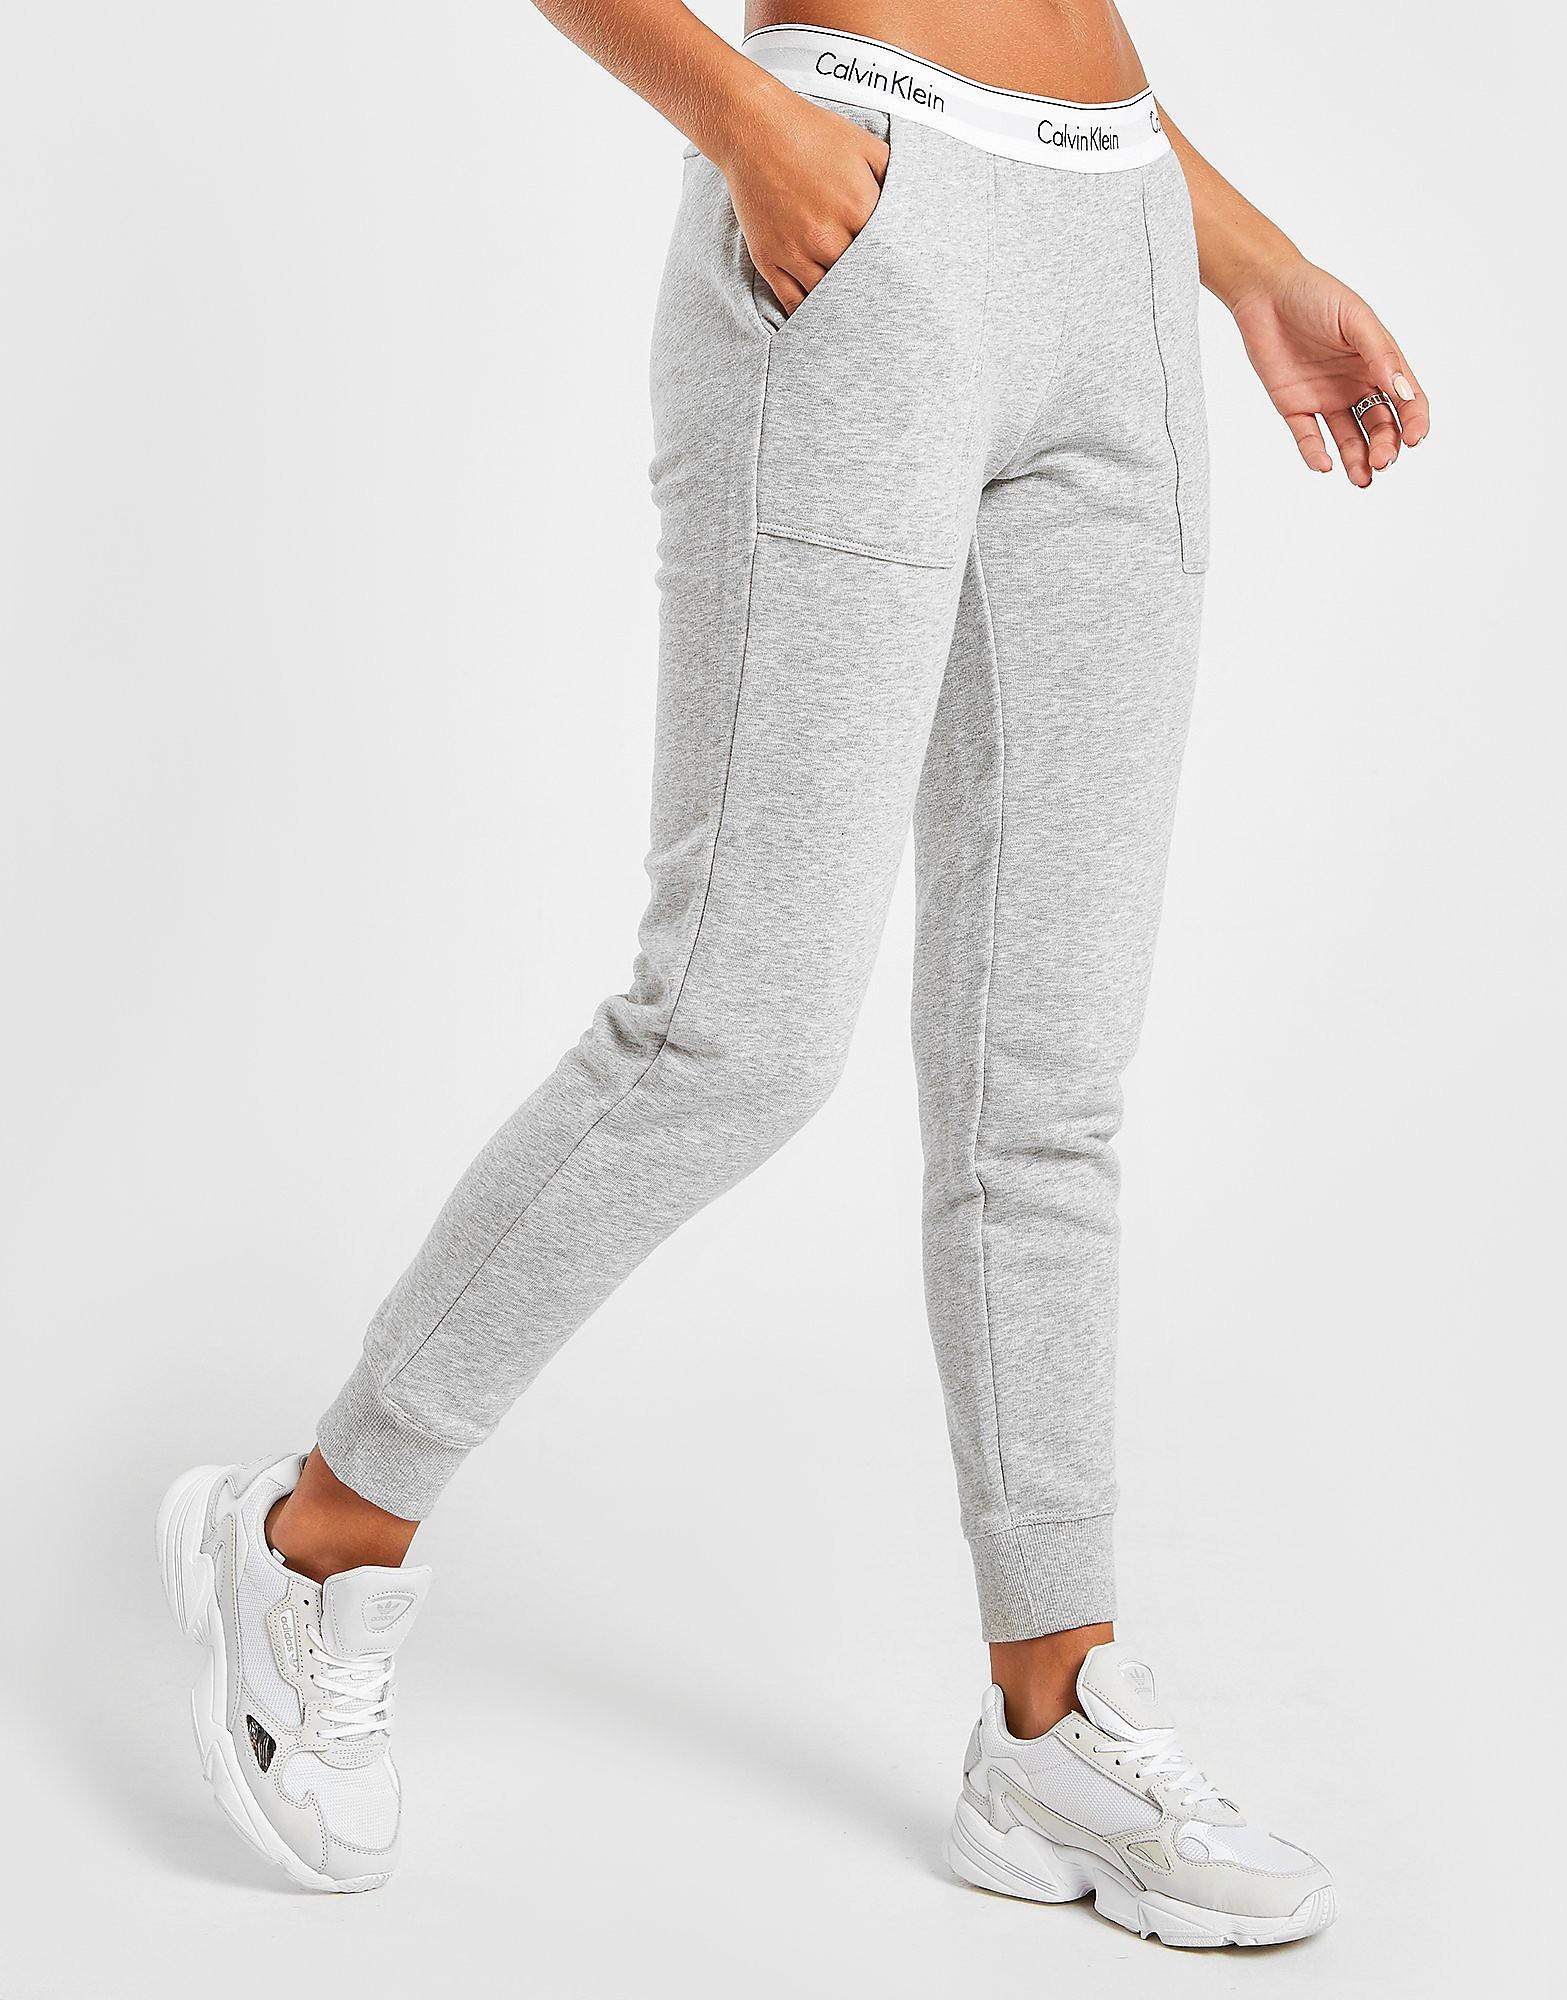 Calvin Klein Track Pants